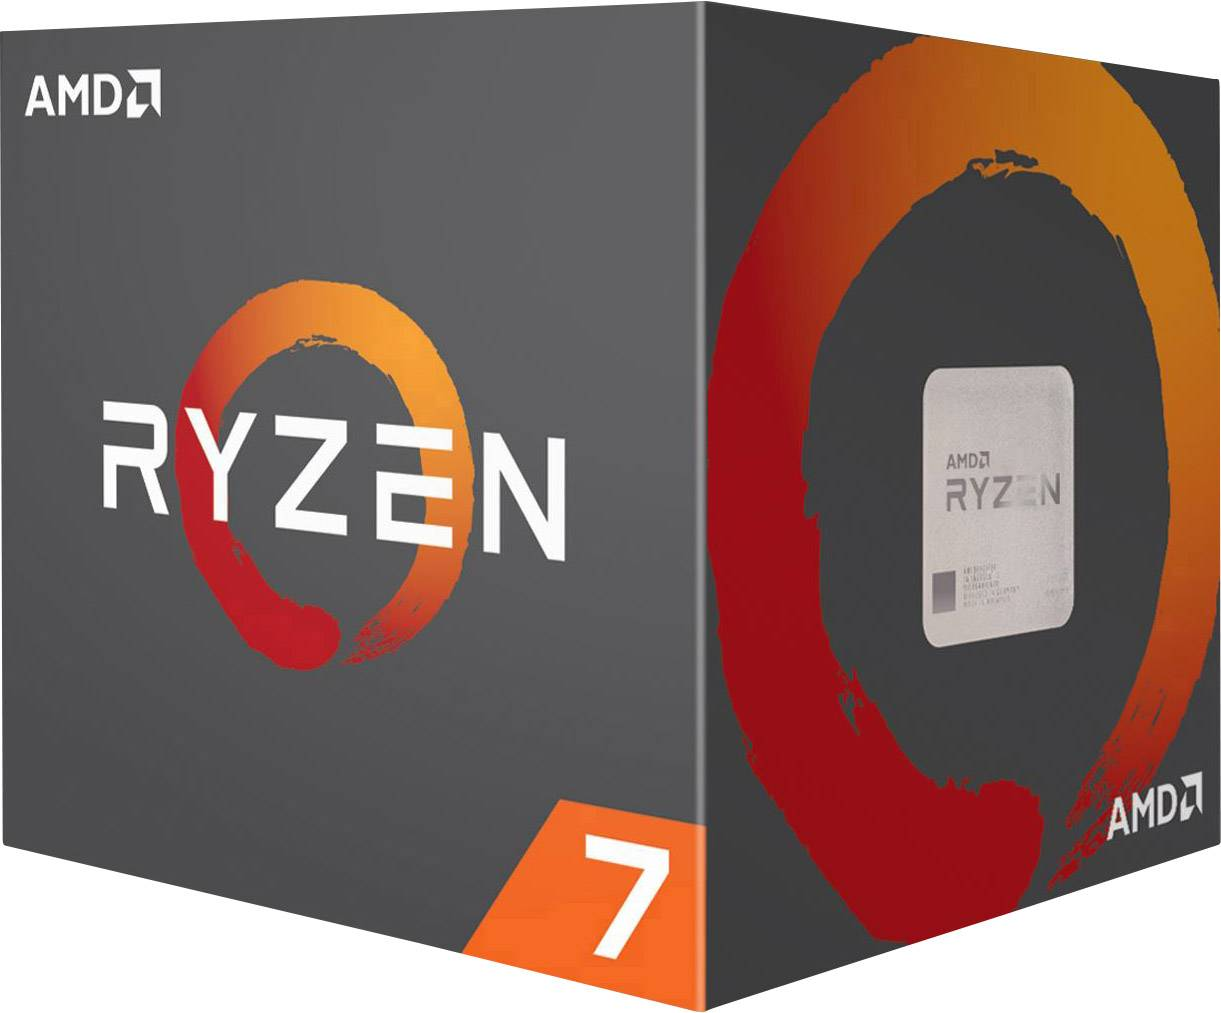 Amd Ryzen 7 3700x 8 X 3 6 Ghz Octa Core Boxed Processor Pc Base Amd Am4 65 W Conrad Com